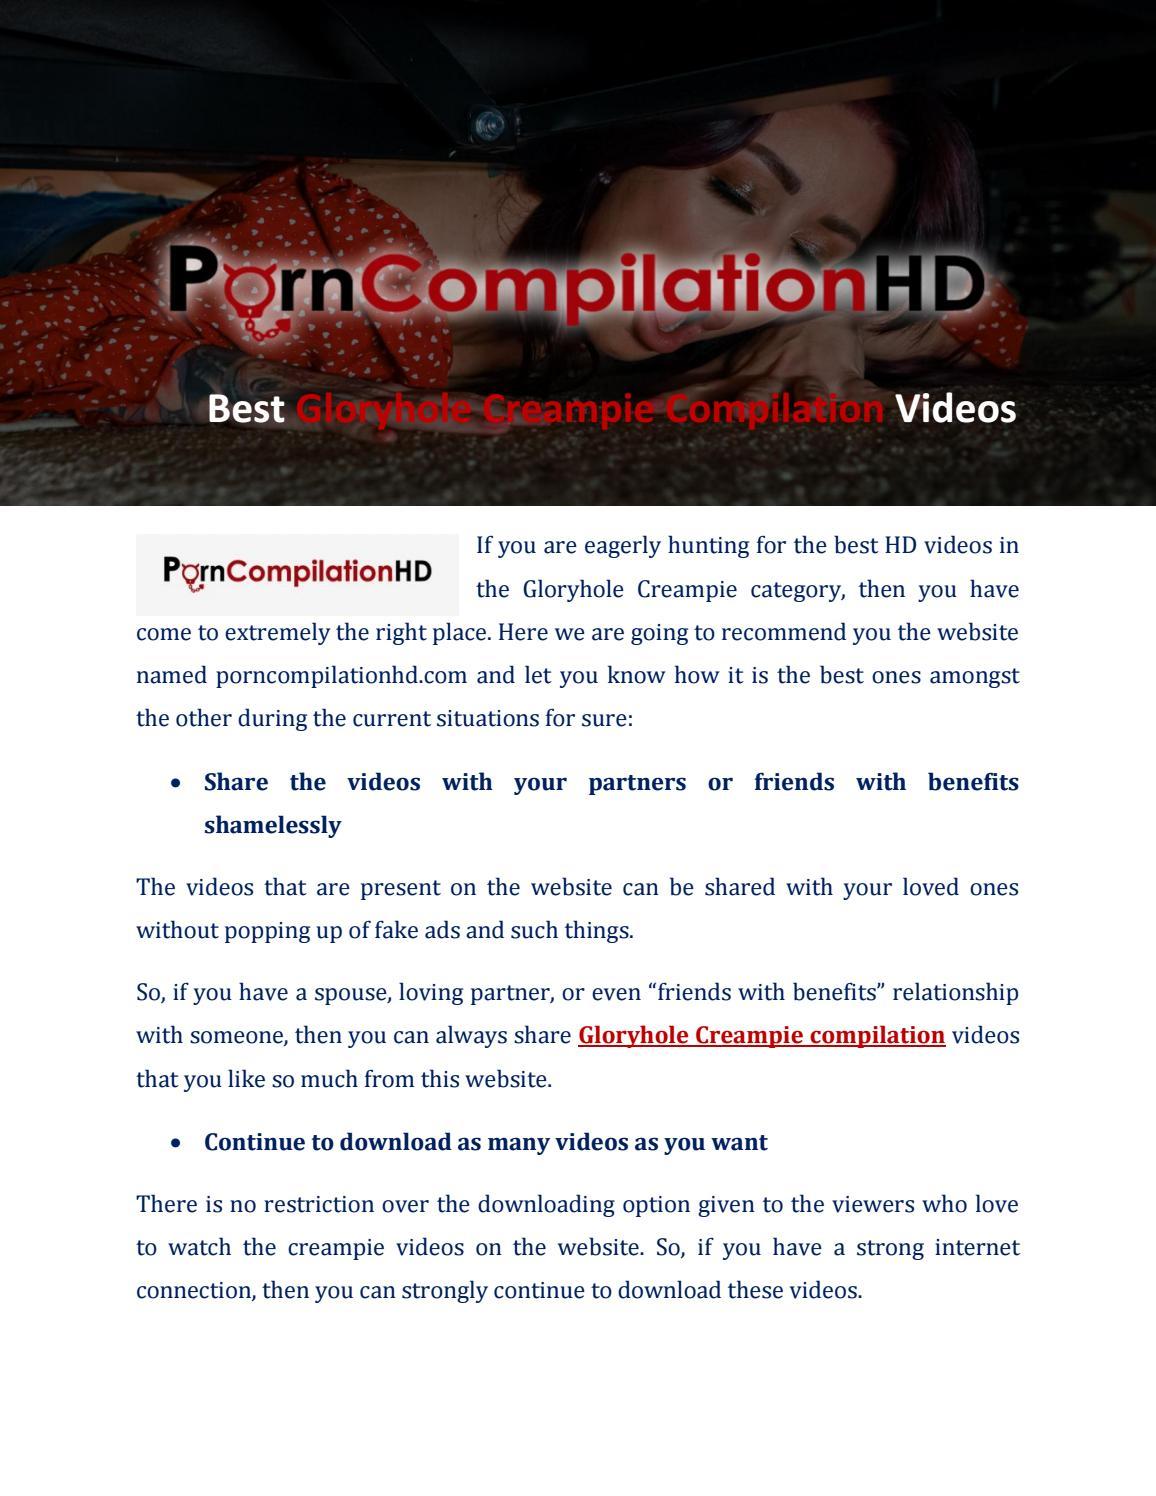 Best Gloryhole Creampie Compilation Videos